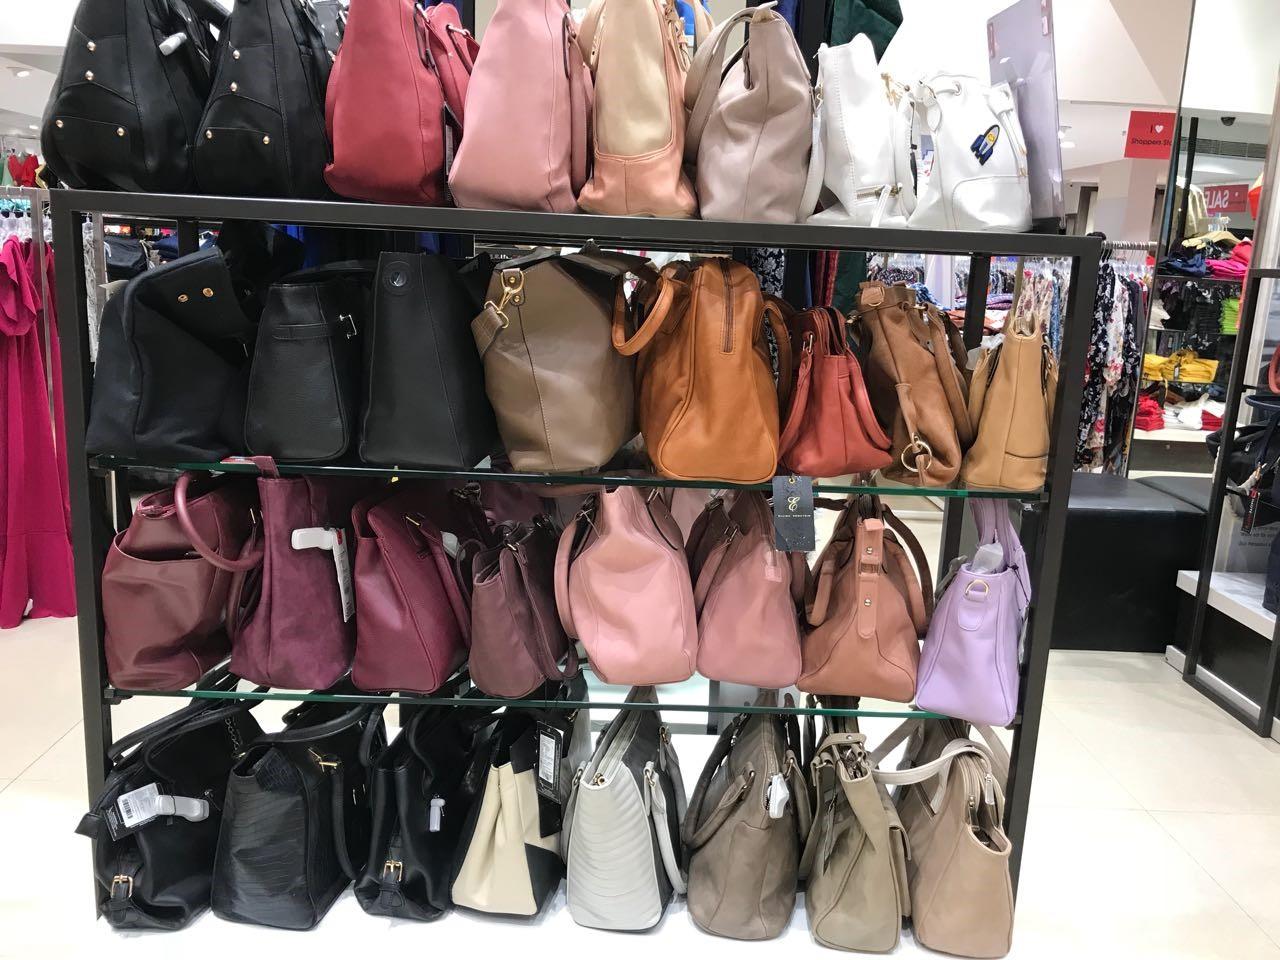 bag section internship journey of a jediiian at shoppers stop - bag section1 - Internship Journey of a JEDIIIAN at Shoppers Stop